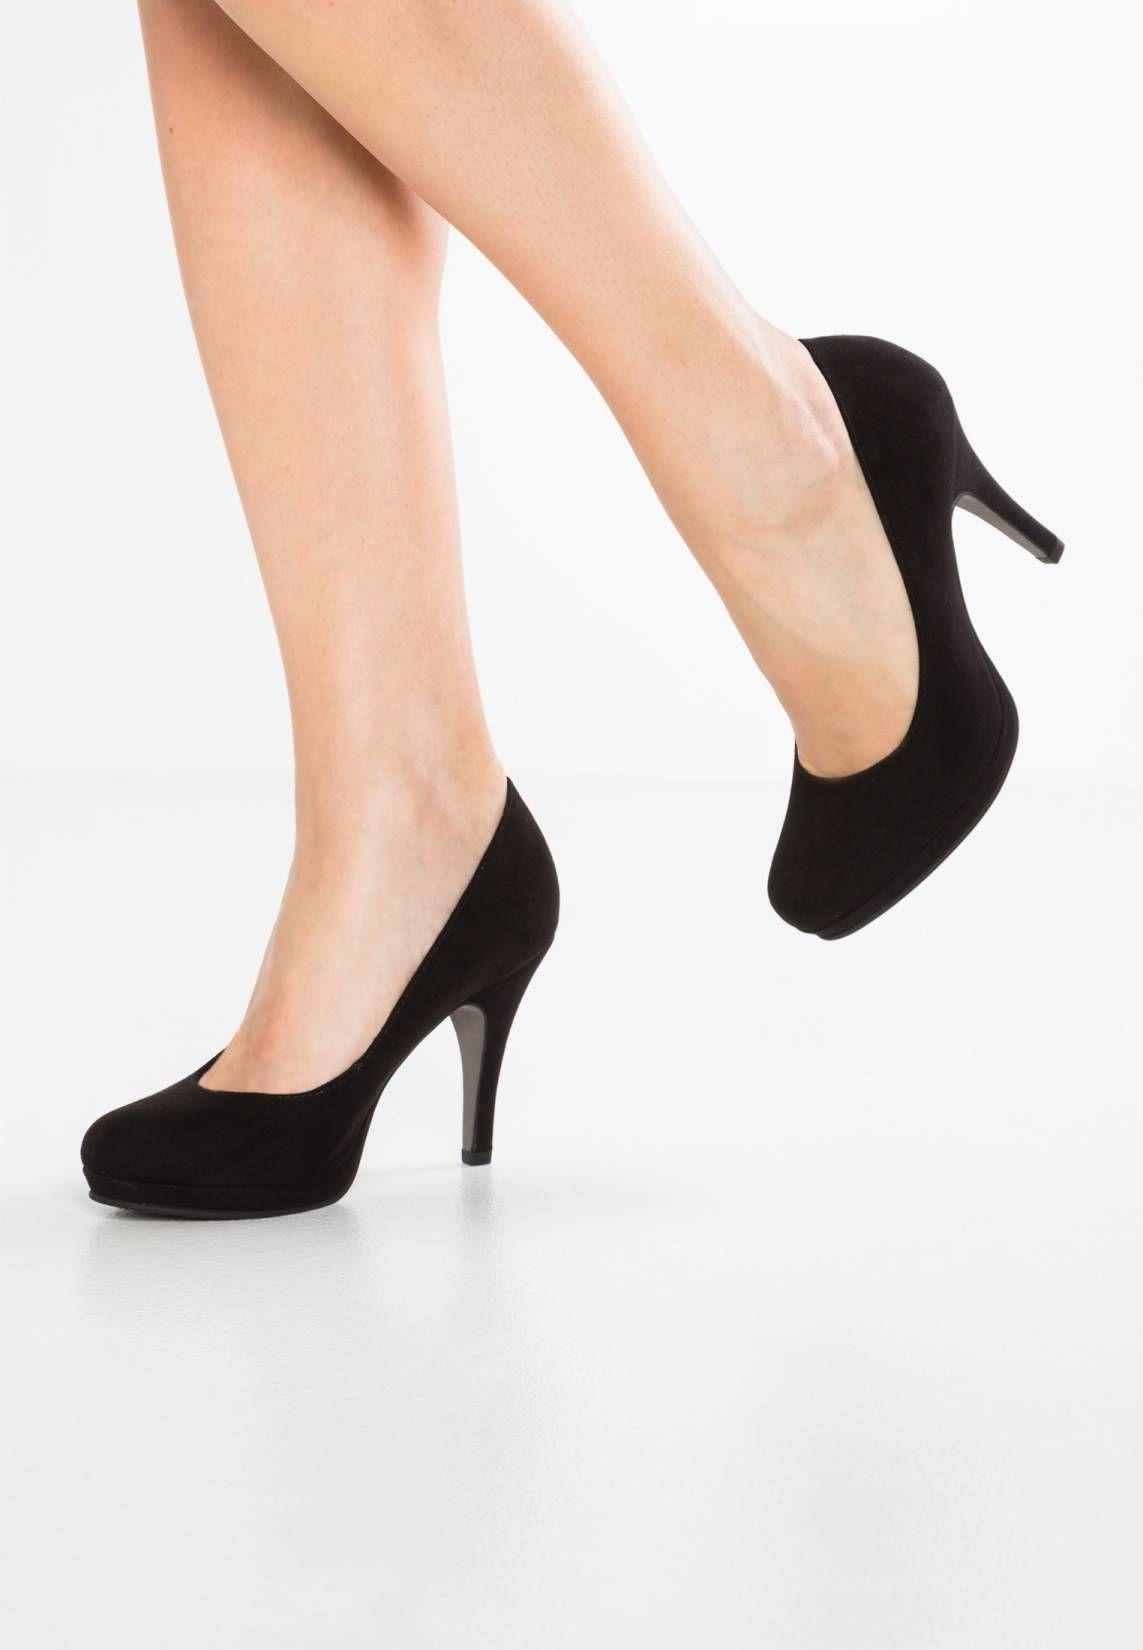 Tamaris. High Heel Pumps black. Sohle:Kunststoff